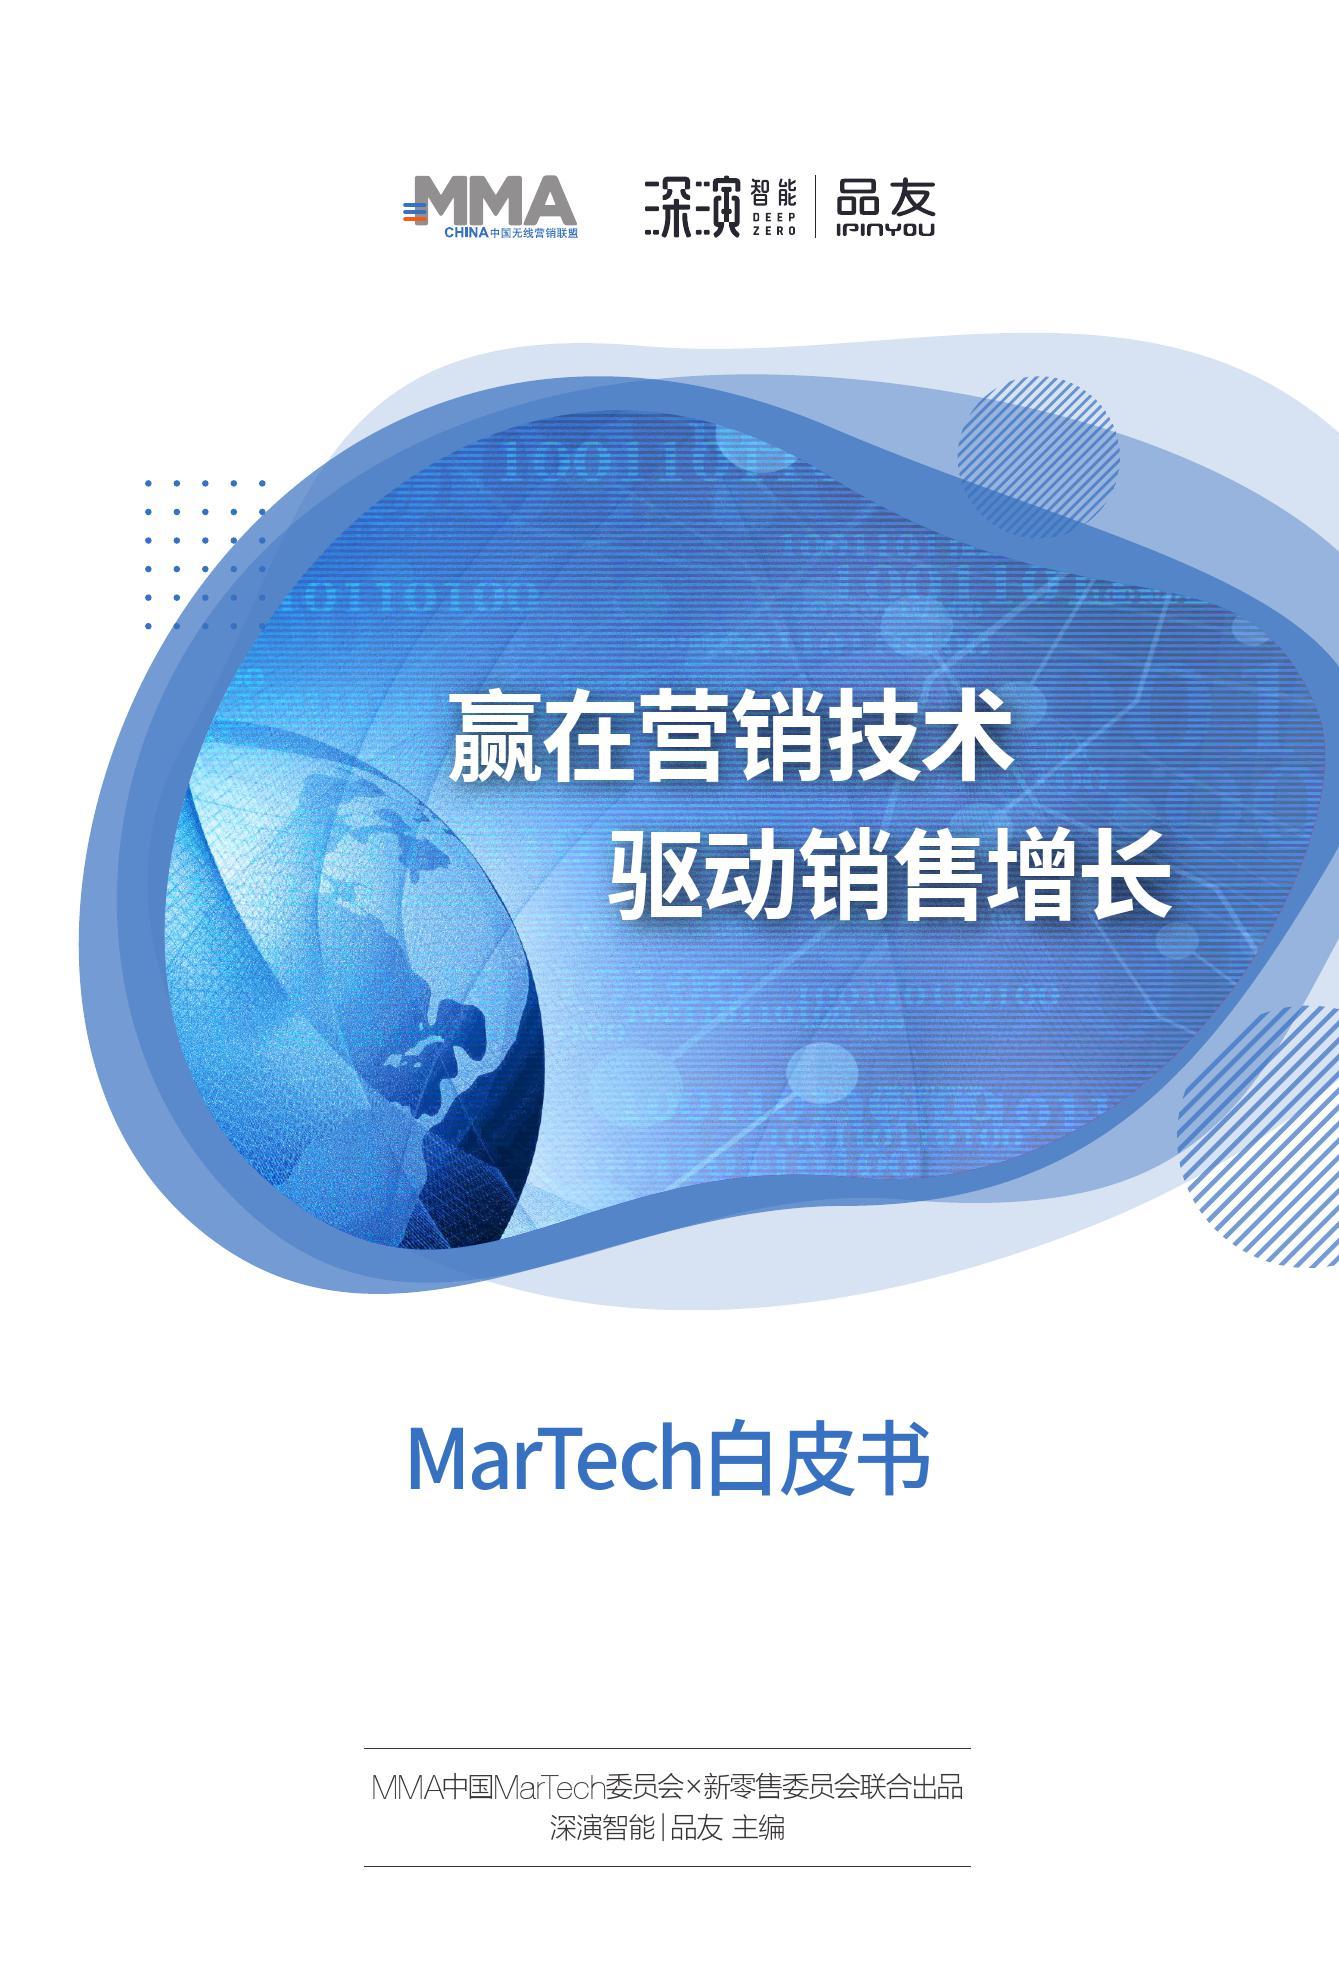 MarTech白皮书:赢在营销技术 驱动销售增长(附下载)